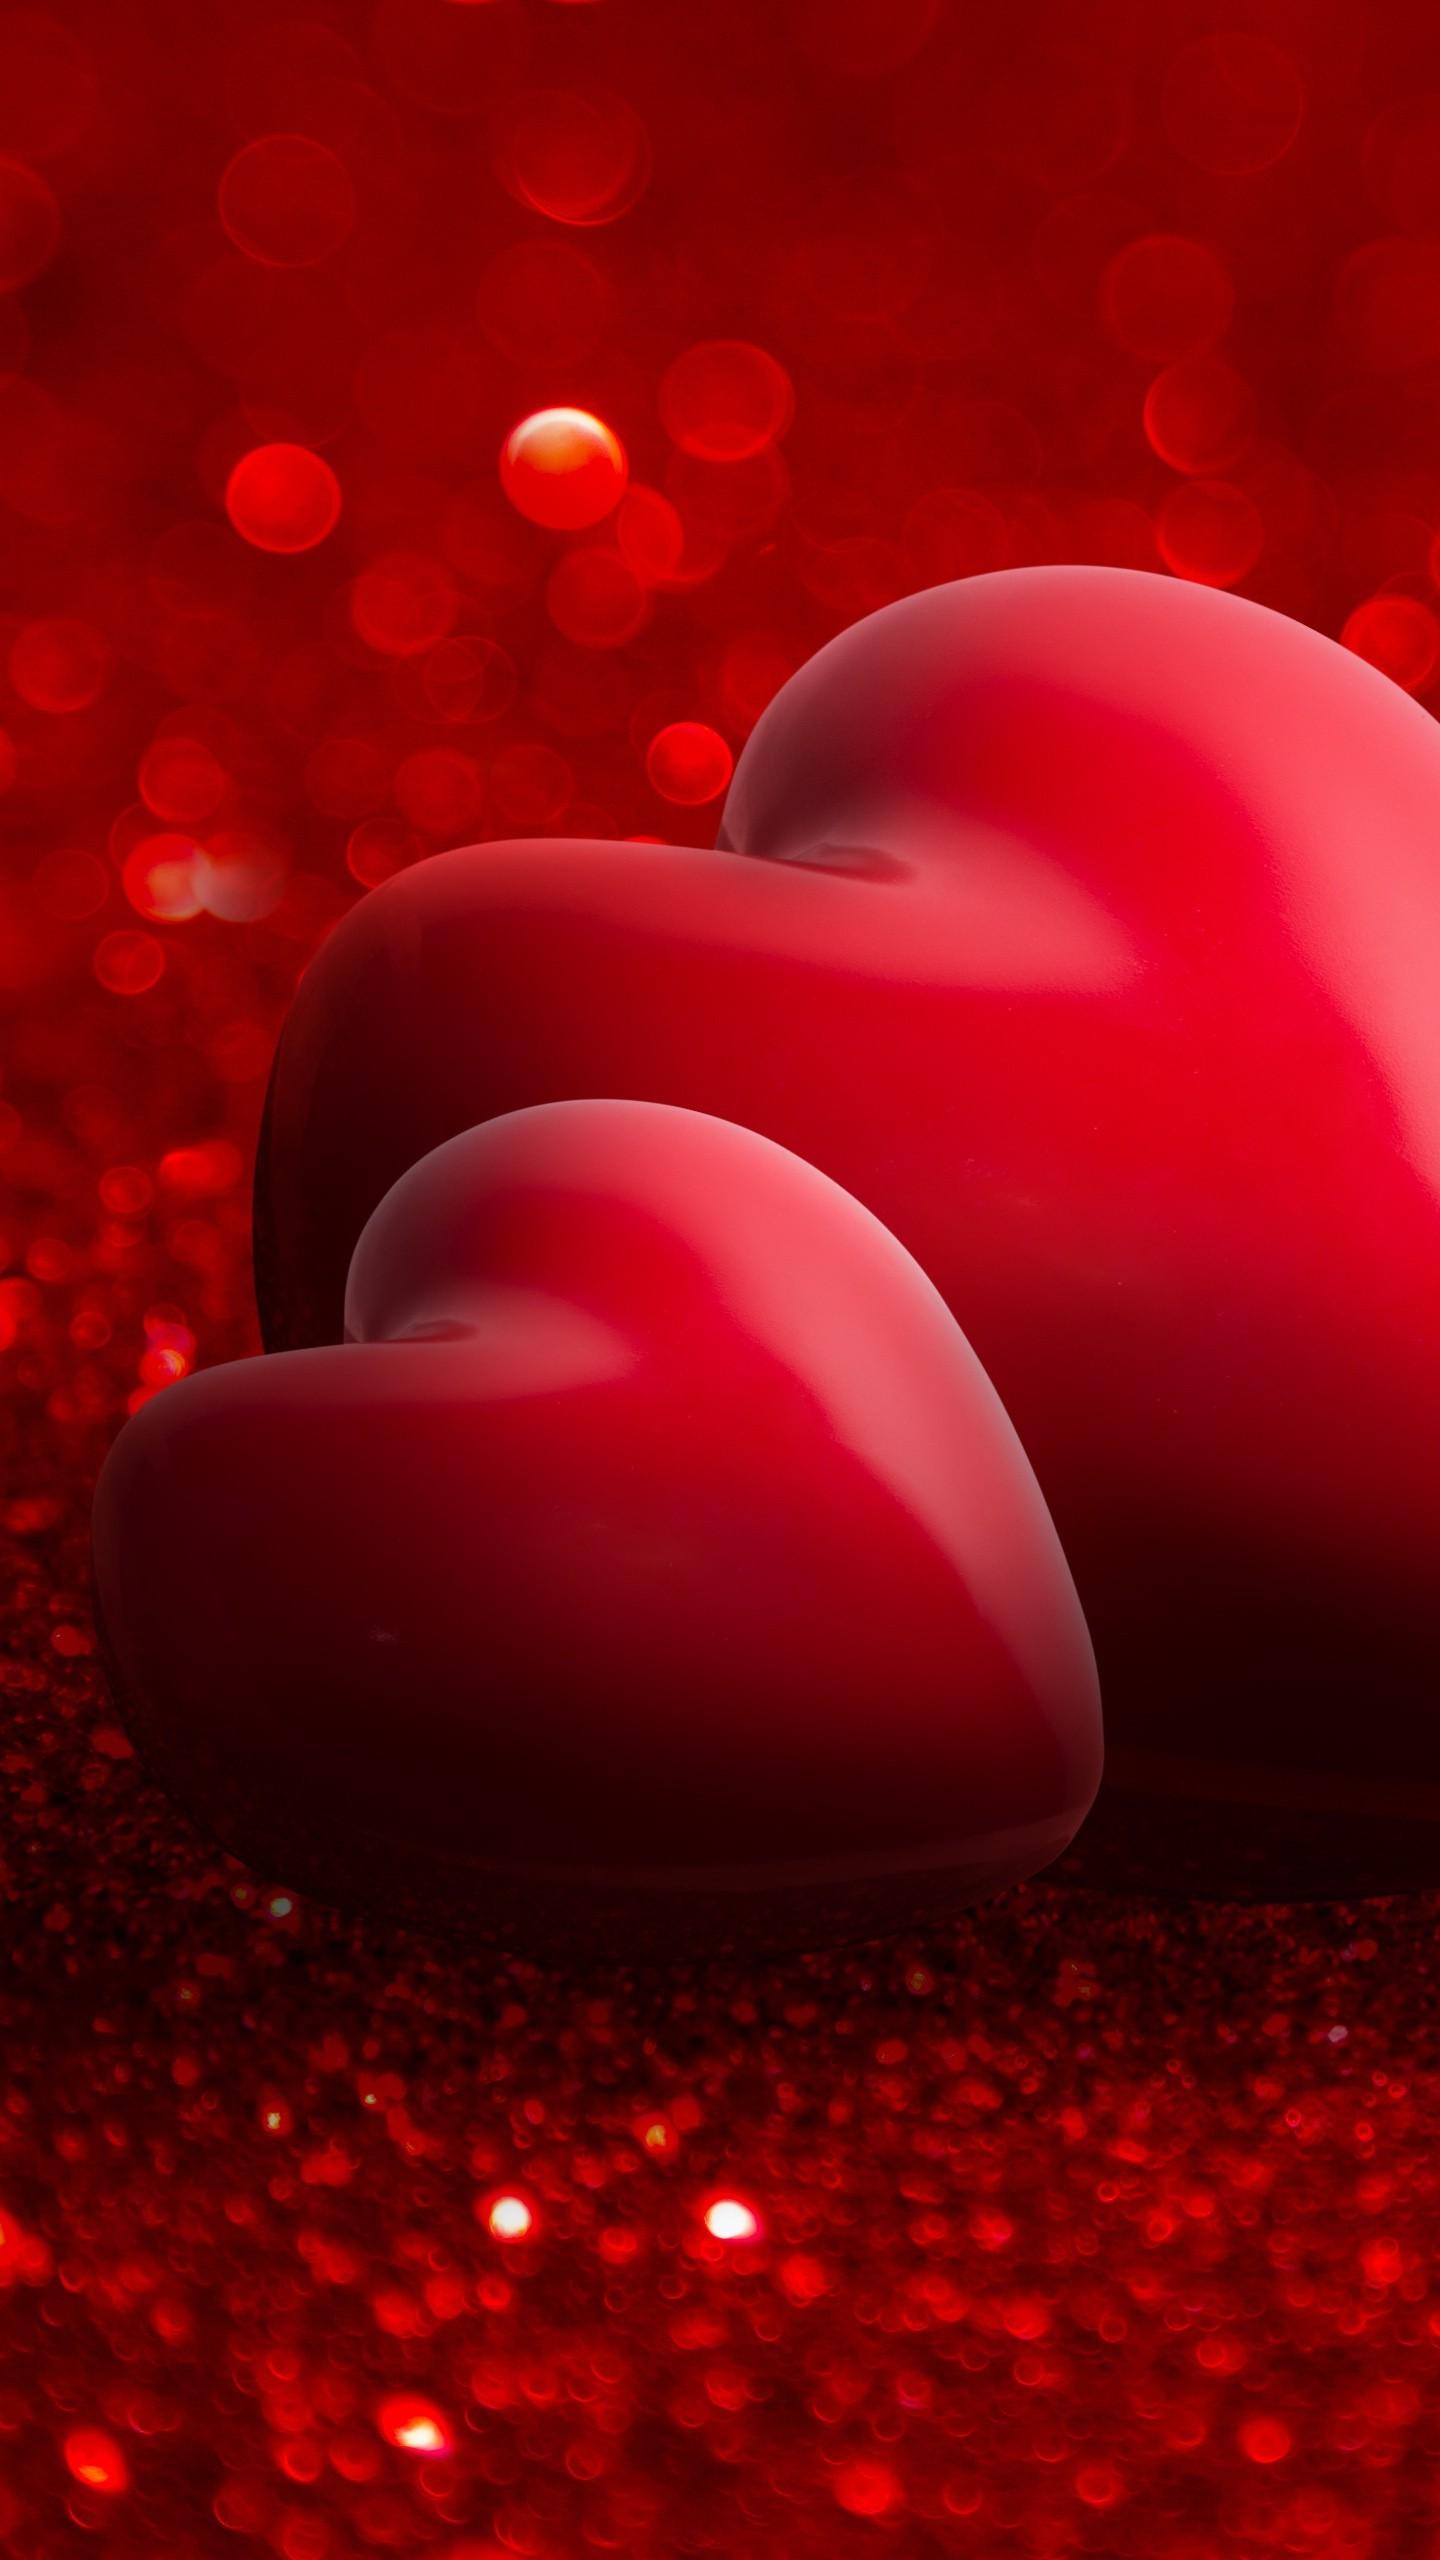 Wallpaper valentine 39 s day love image heart red 4k - Heart to heart wallpaper ...